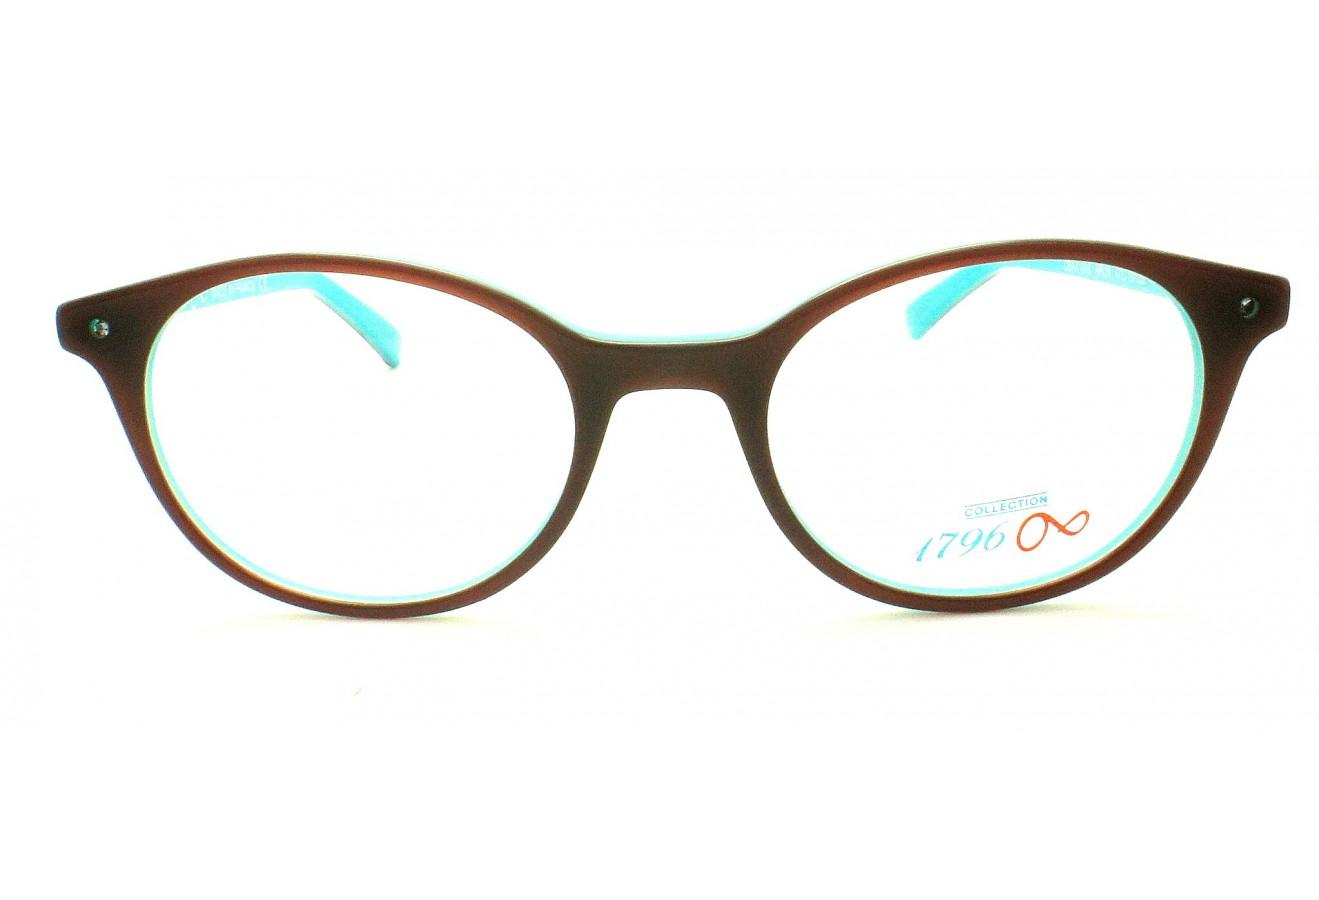 lunettes de vue 1796 cbaa 1816 brun 47 19. Black Bedroom Furniture Sets. Home Design Ideas